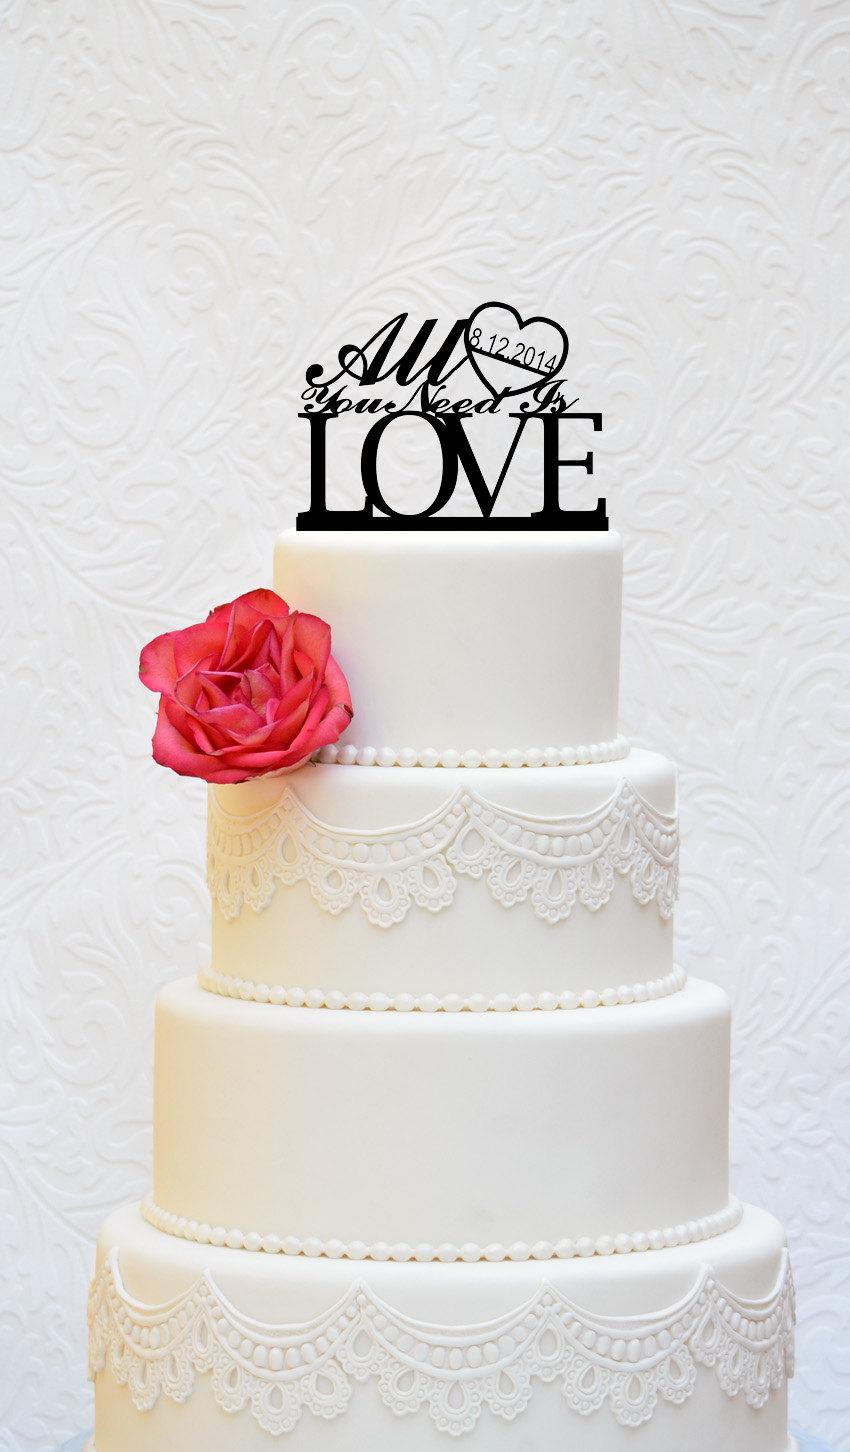 Свадьба - Custom Wedding Cake Topper All You Need Is LOVE Cake Topper (Item Number 10113)